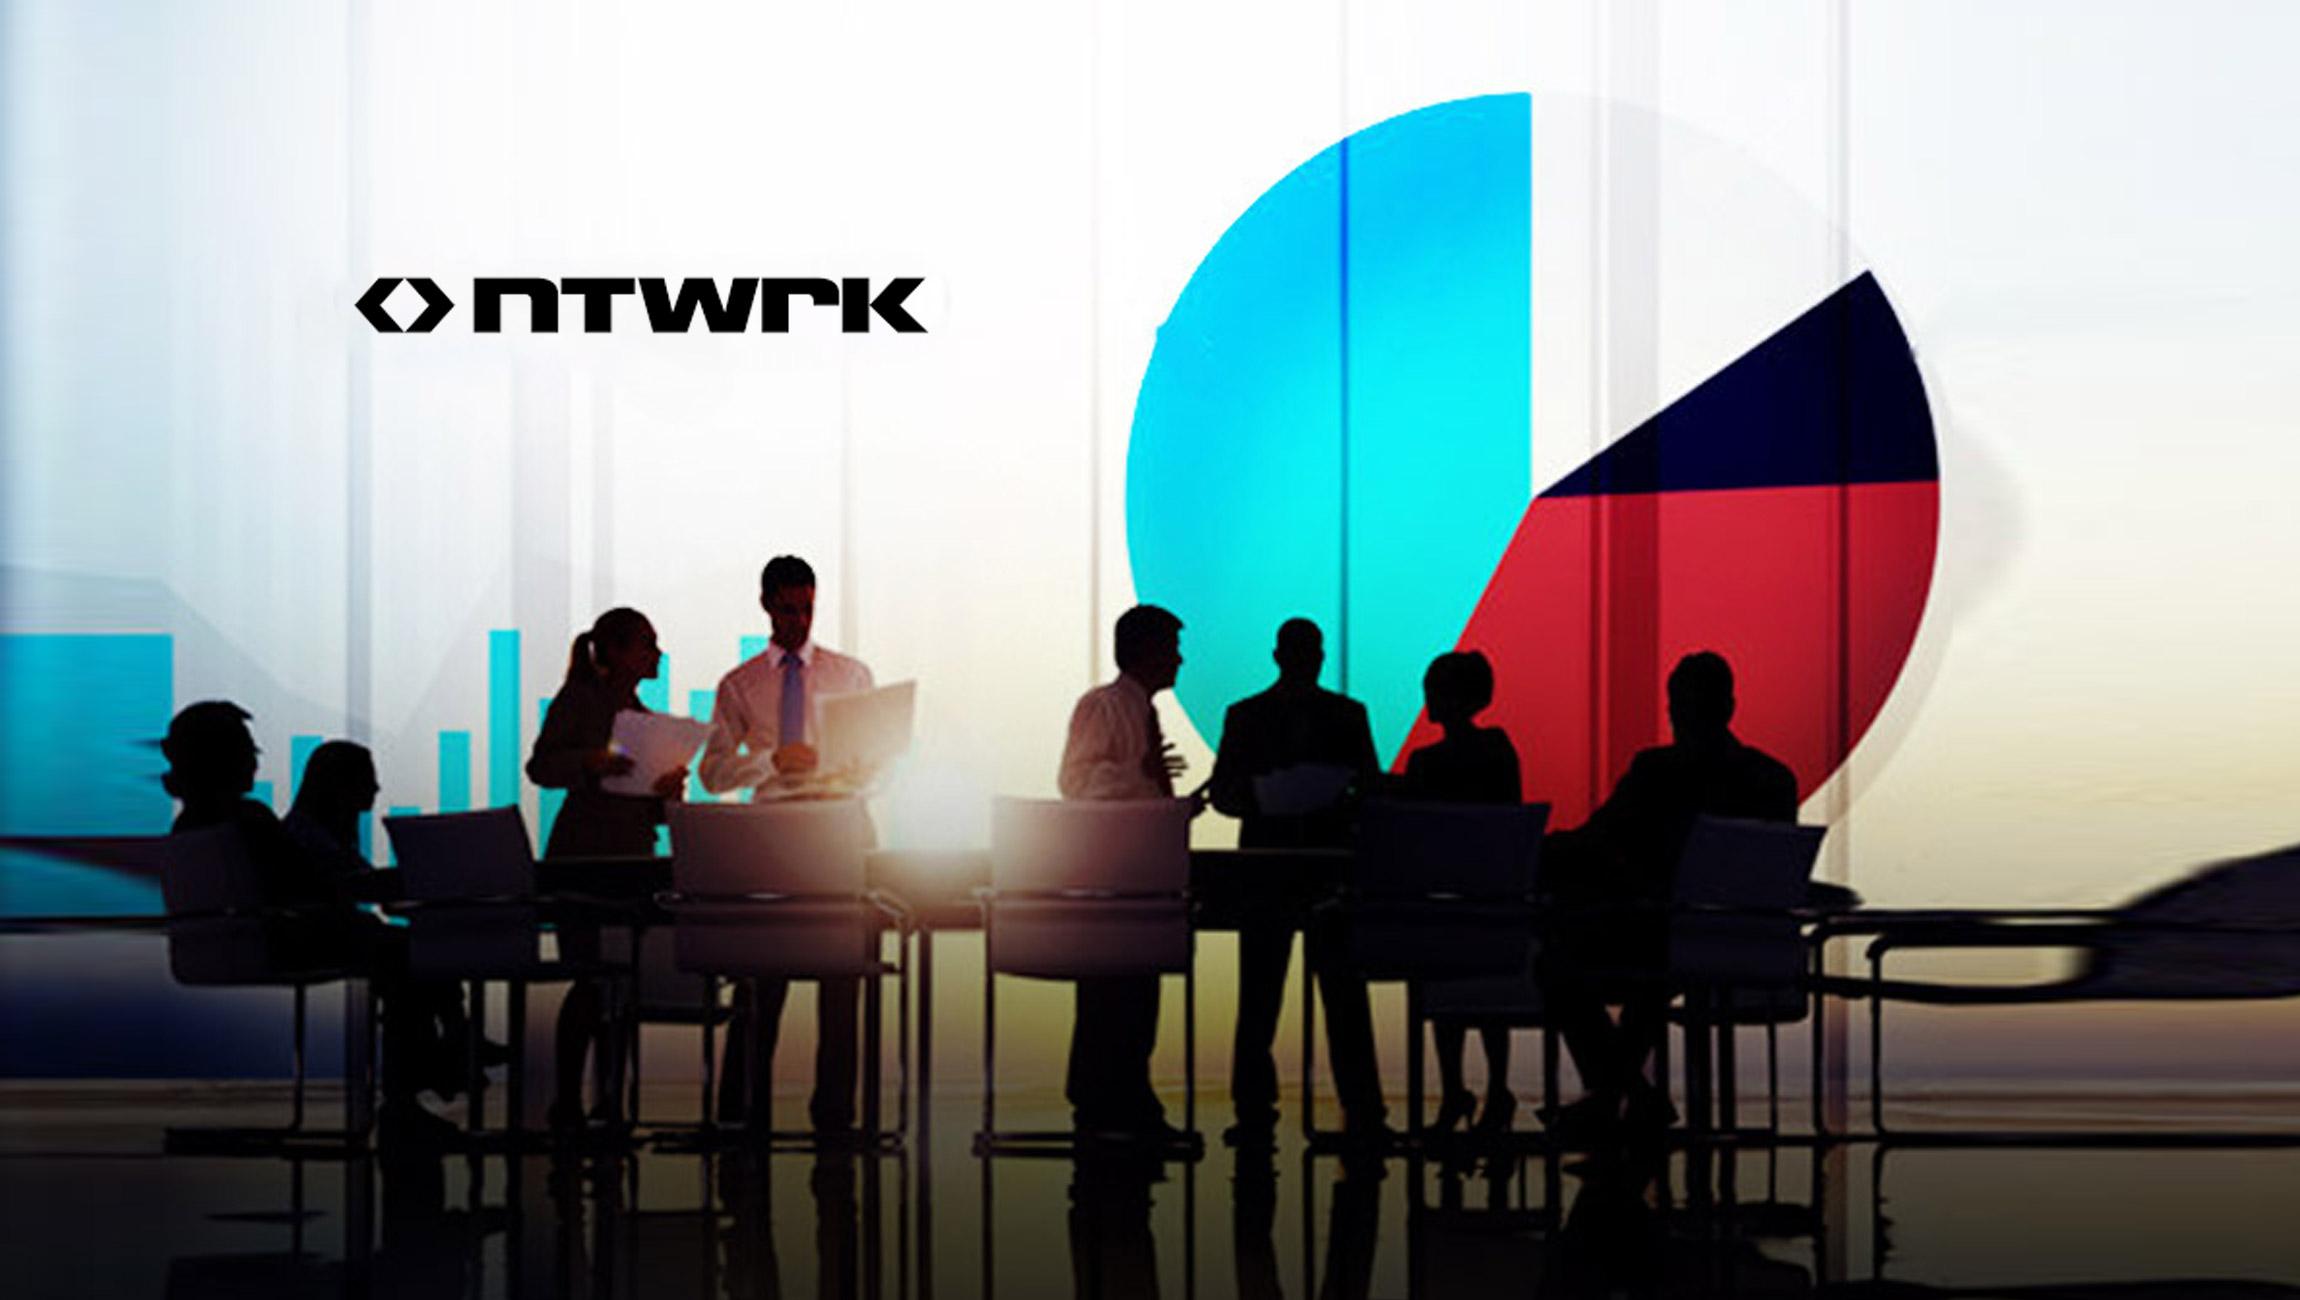 NTWRK, North America's Leading Livestream Shopping Platform, Receives a $50M Investment Led by Goldman Sachs Asset Management